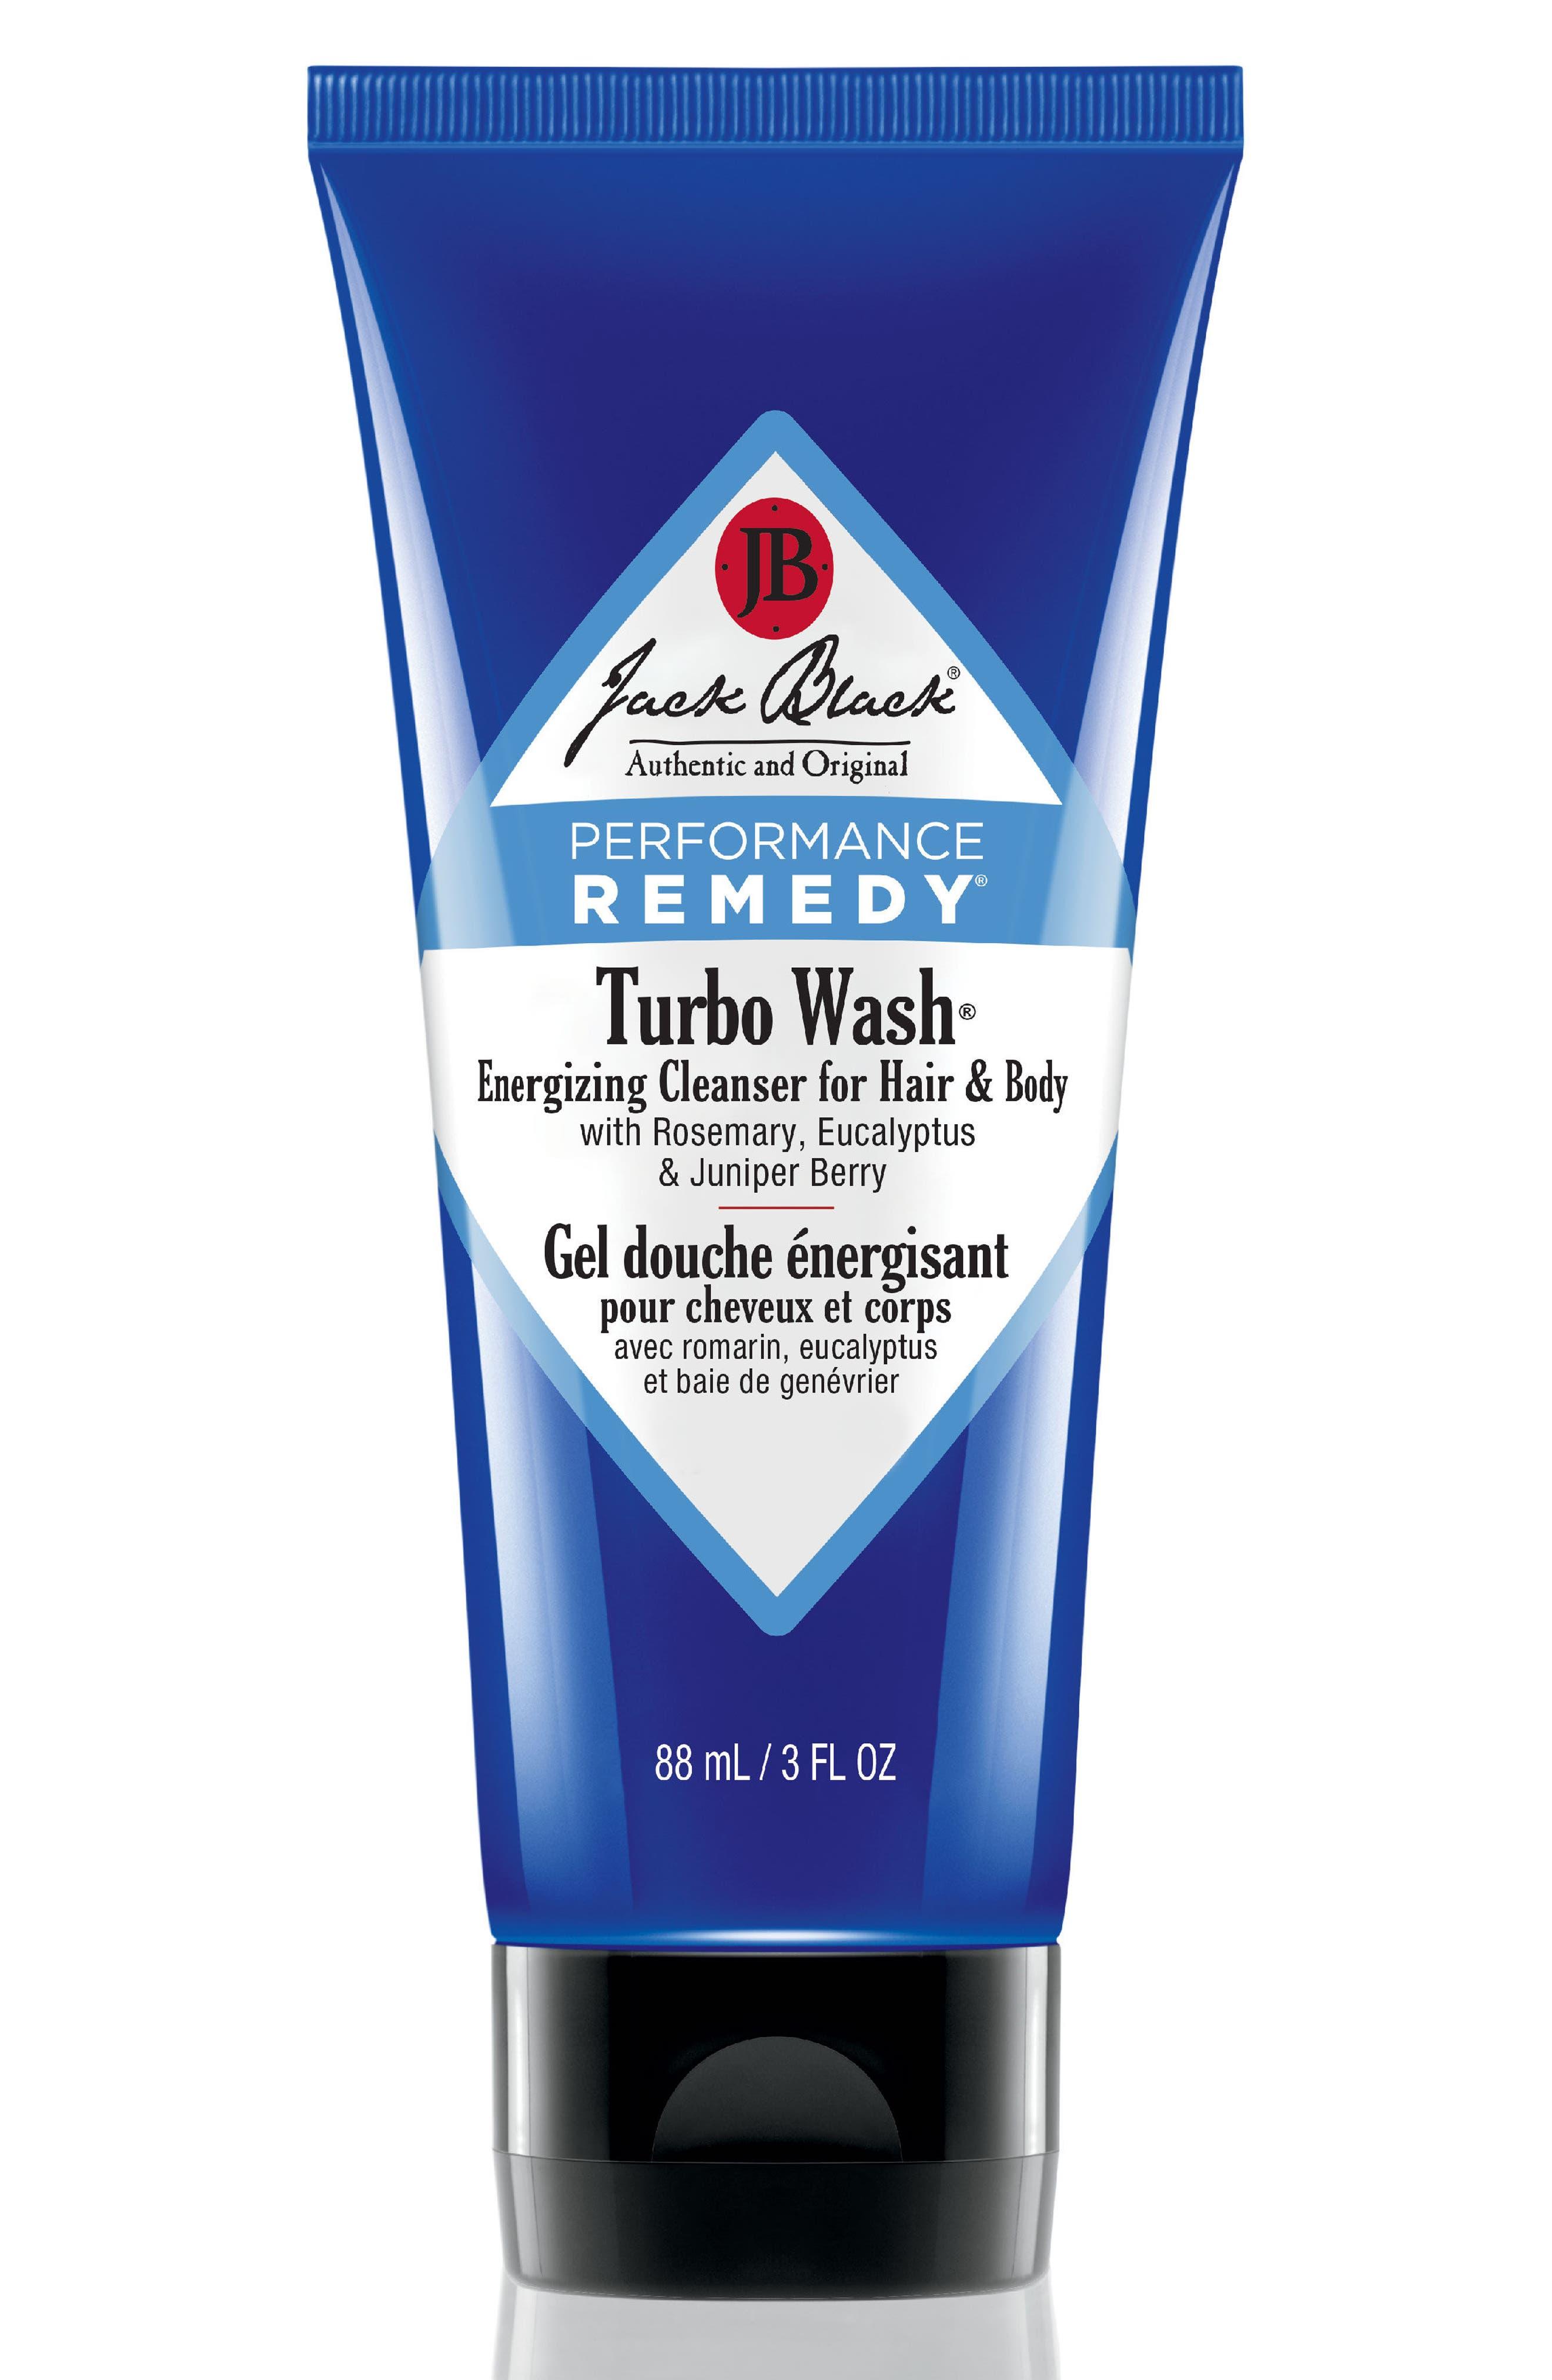 Jack Black 'Turbo Wash' Energizing Cleanser For Hair & Body, Size 33 oz